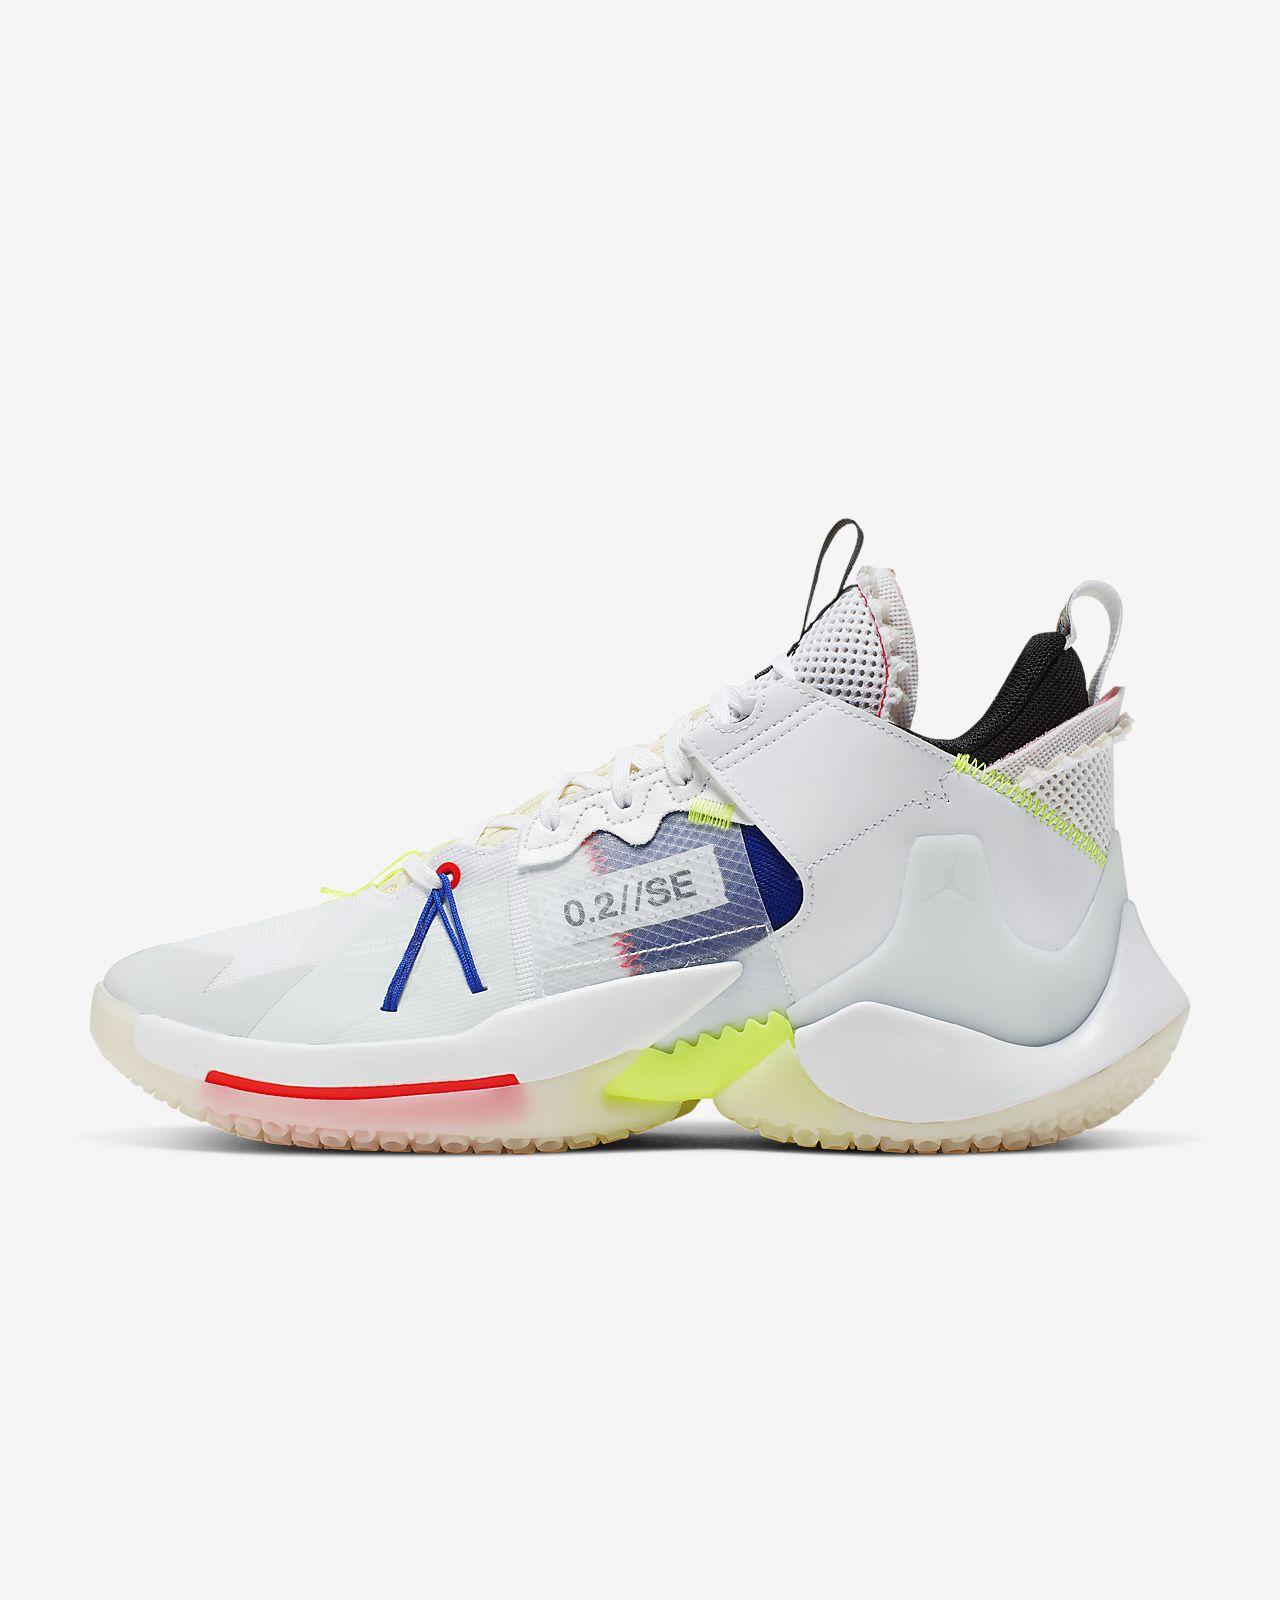 "Pánská basketbalová bota Jordan ""Why Not?"" Pánská basketbalová bota Zer0.2 SE"